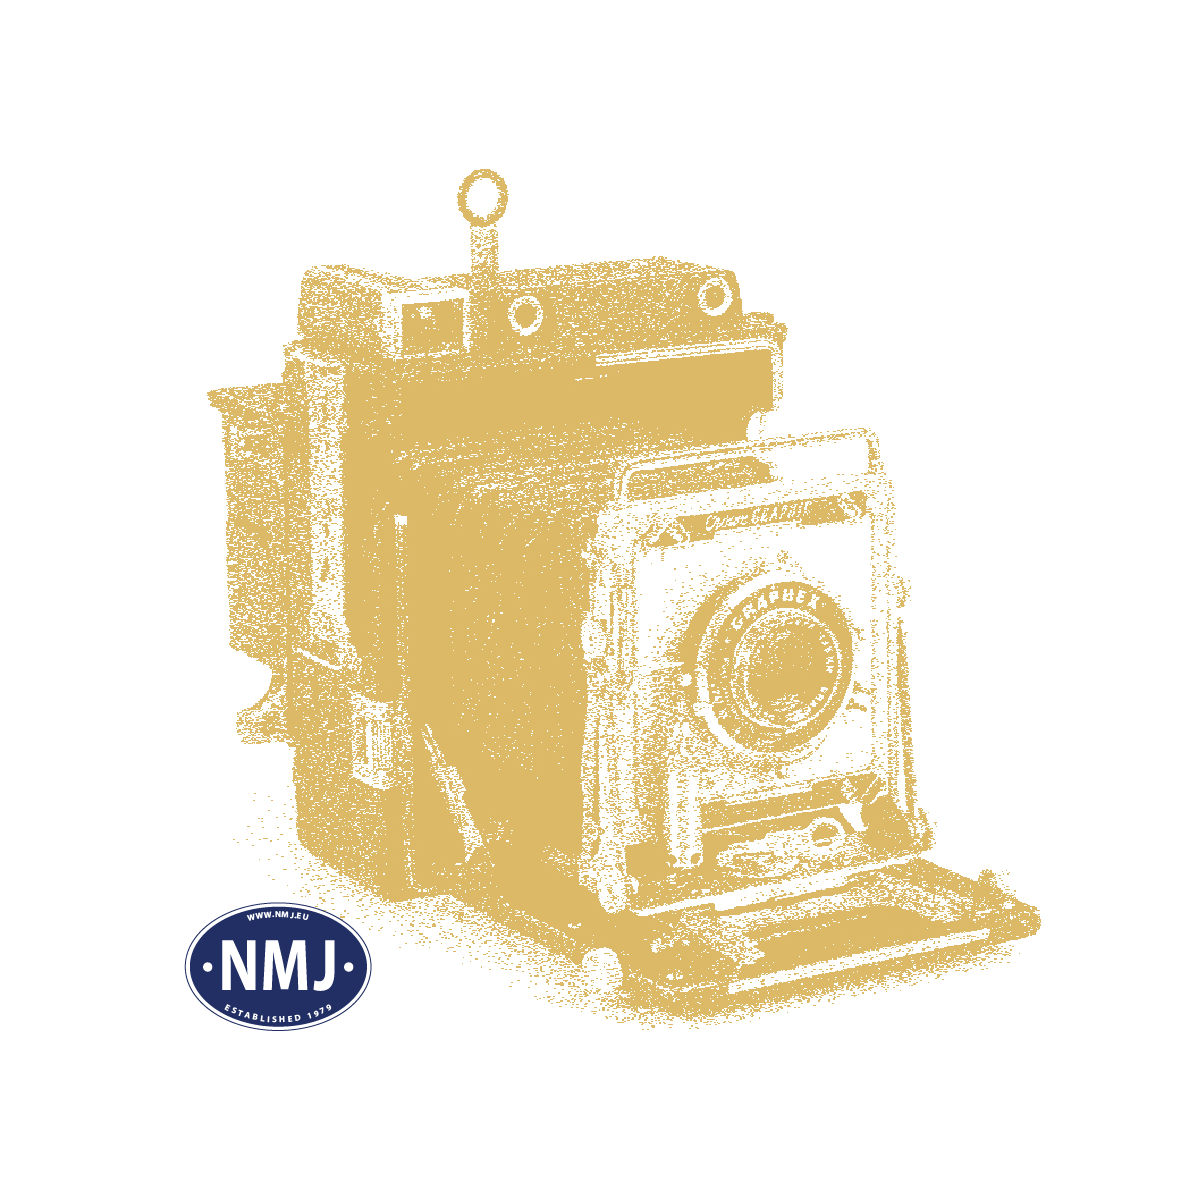 NMJT504.302 - NMJ Topline NSB His 210 2 222-7, type 3